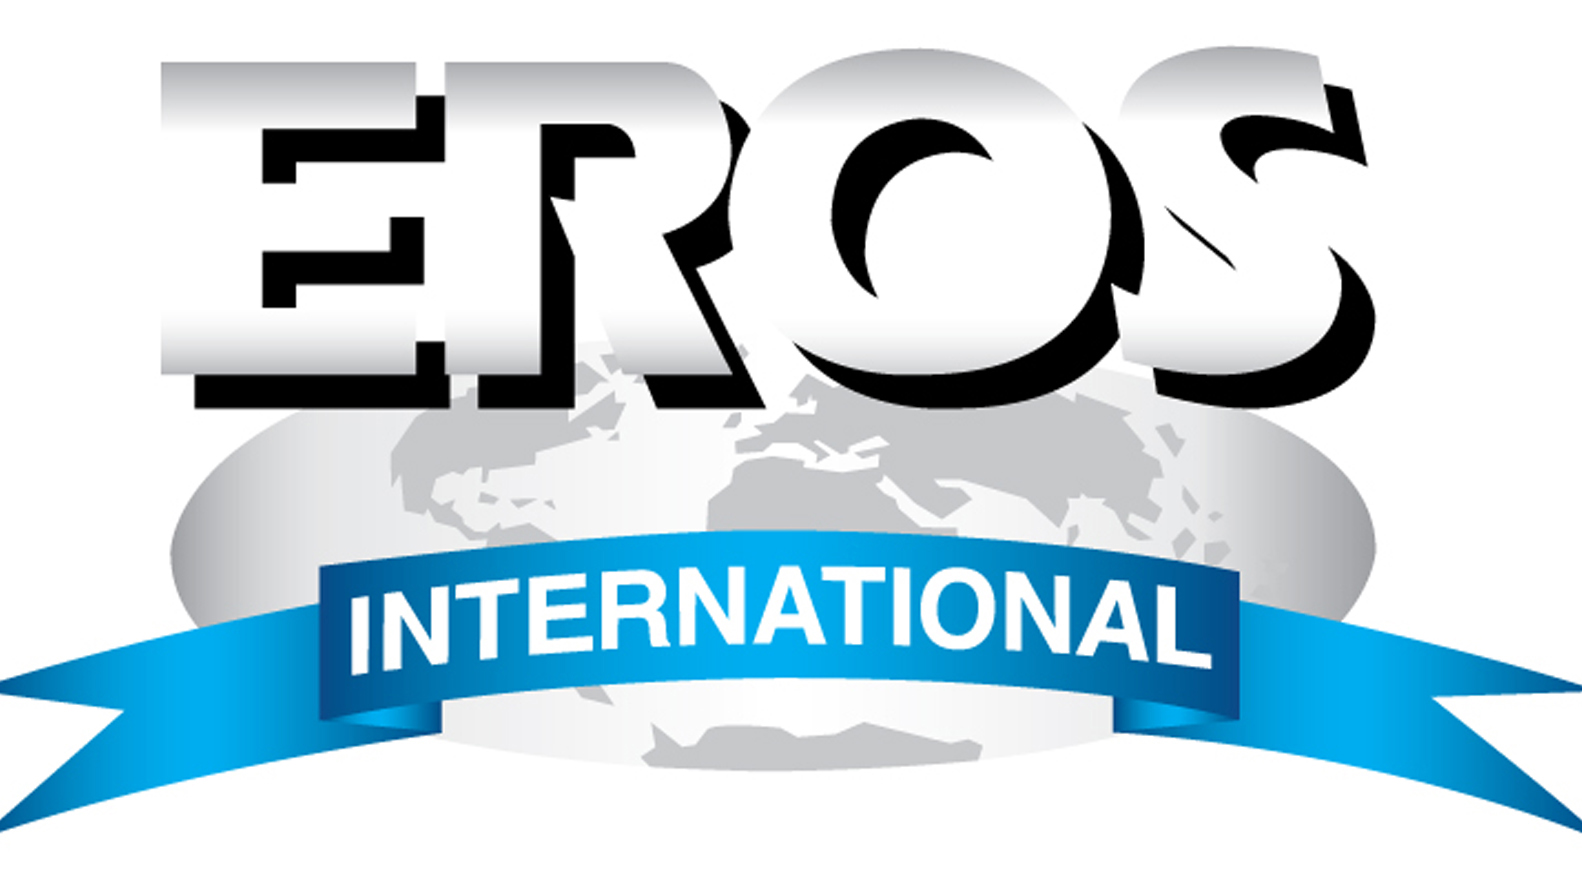 Eros International ties up with Diamond Comics